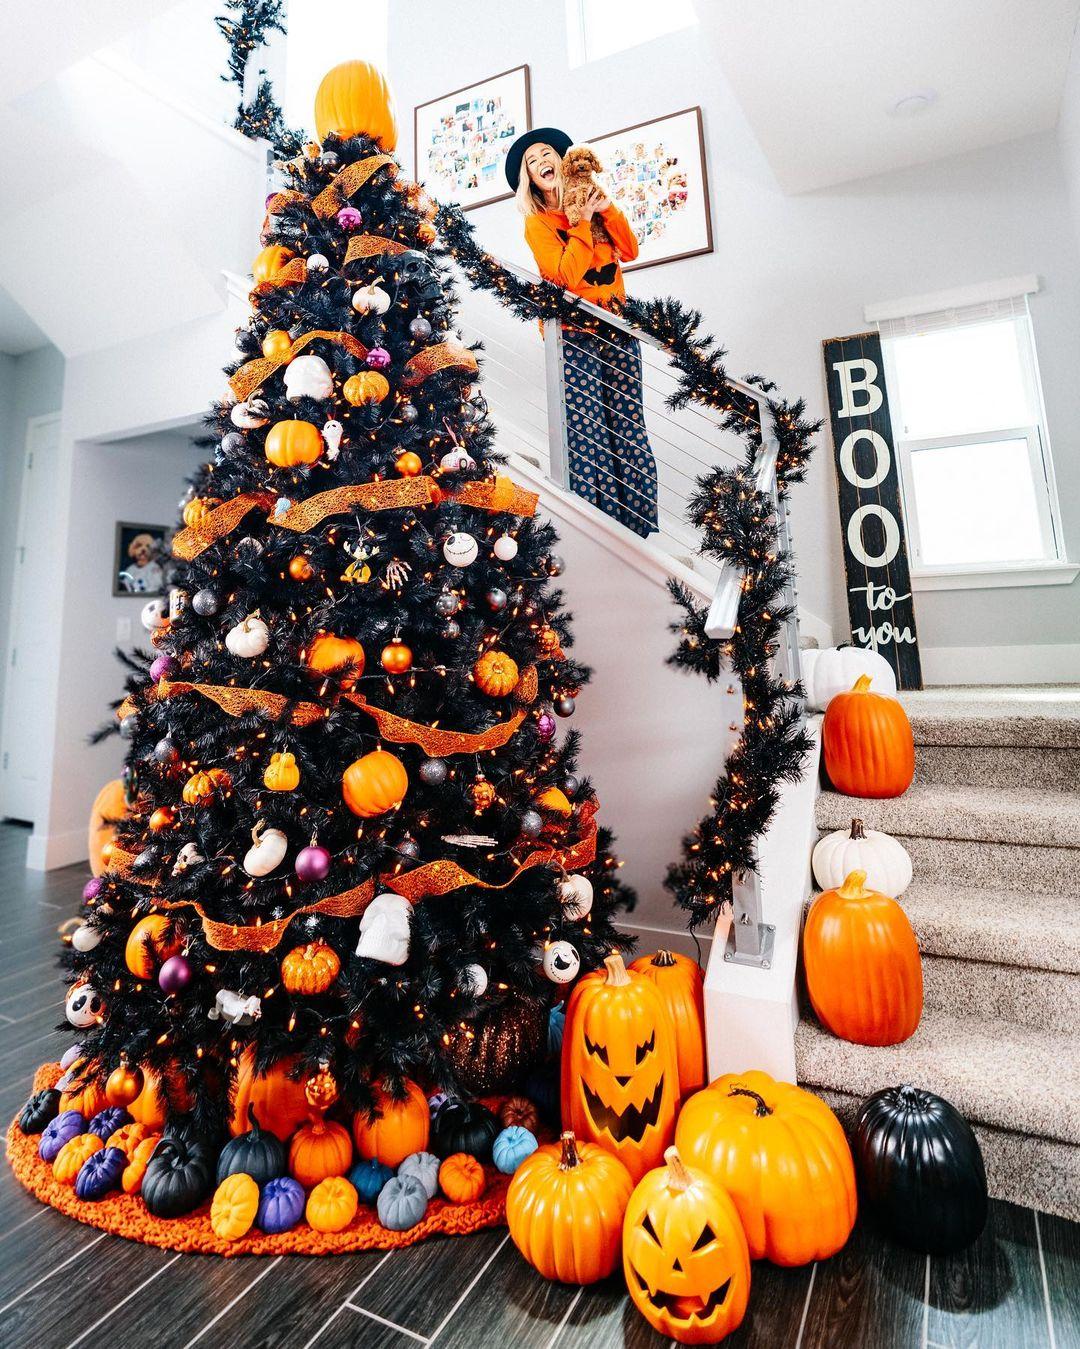 Cute Halloween tree with pumpkins